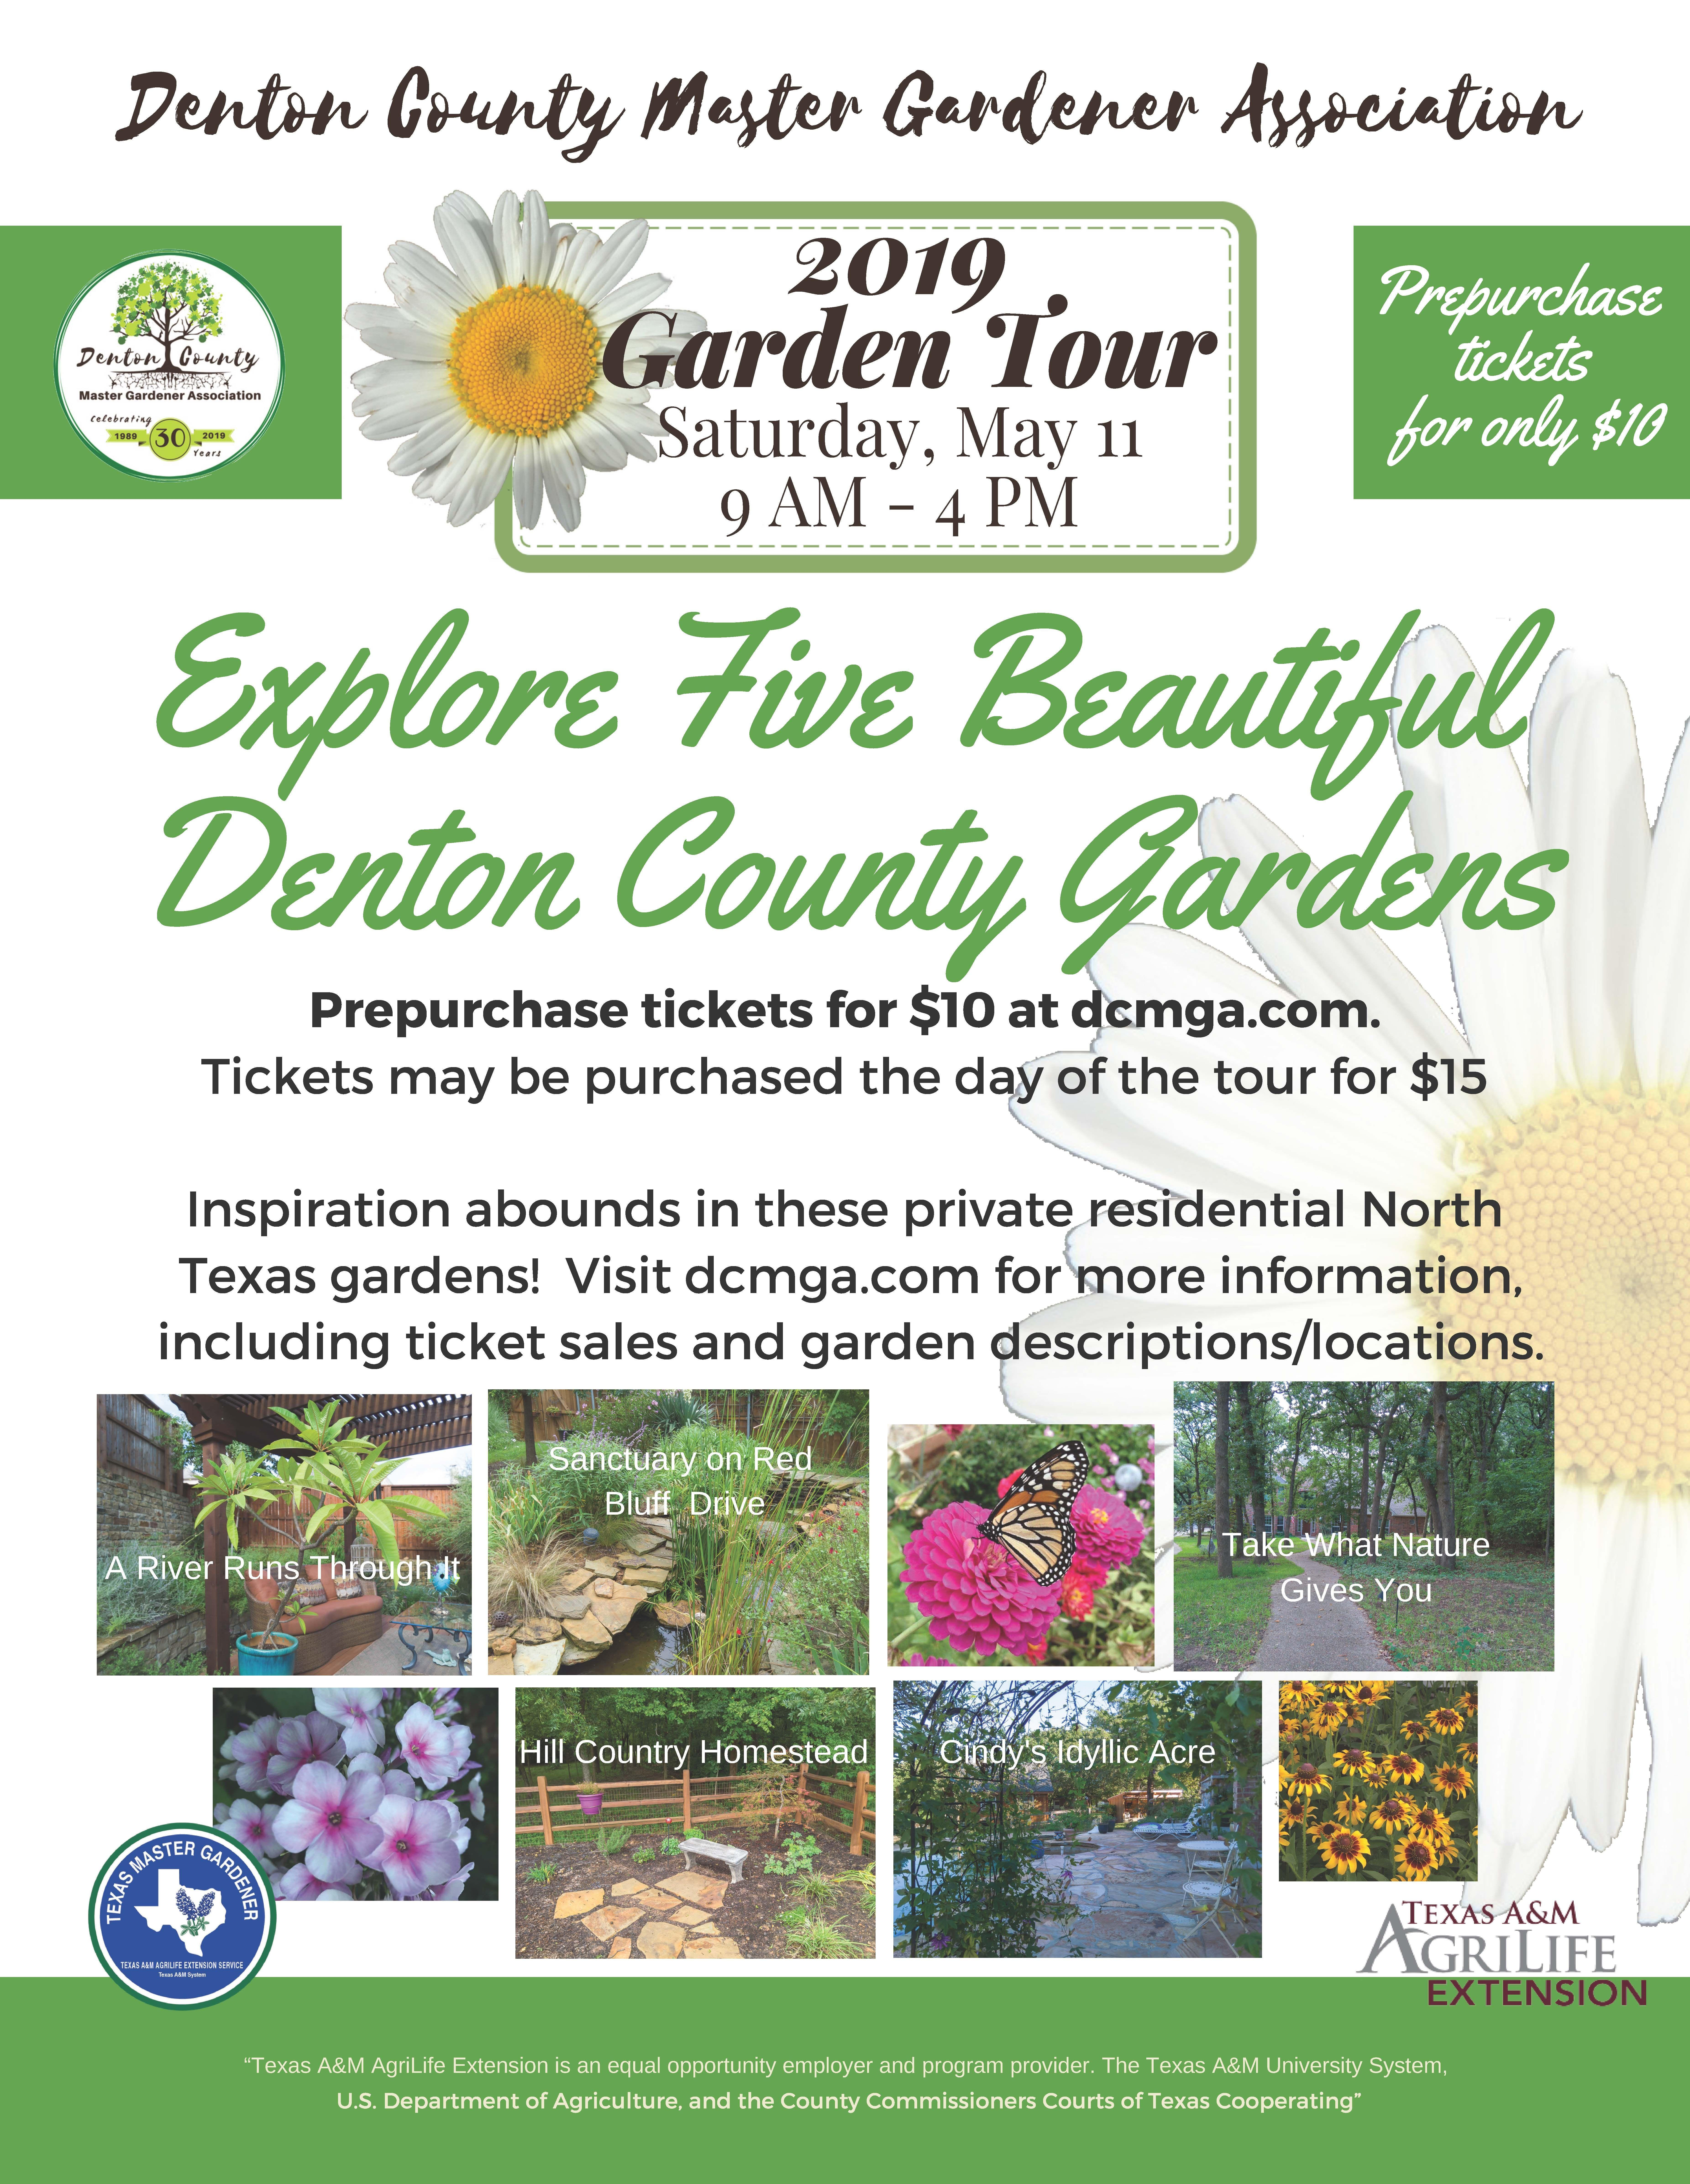 b328145499675d2eeee08fa787d98a2d - Texas Organic Farmers And Gardeners Association